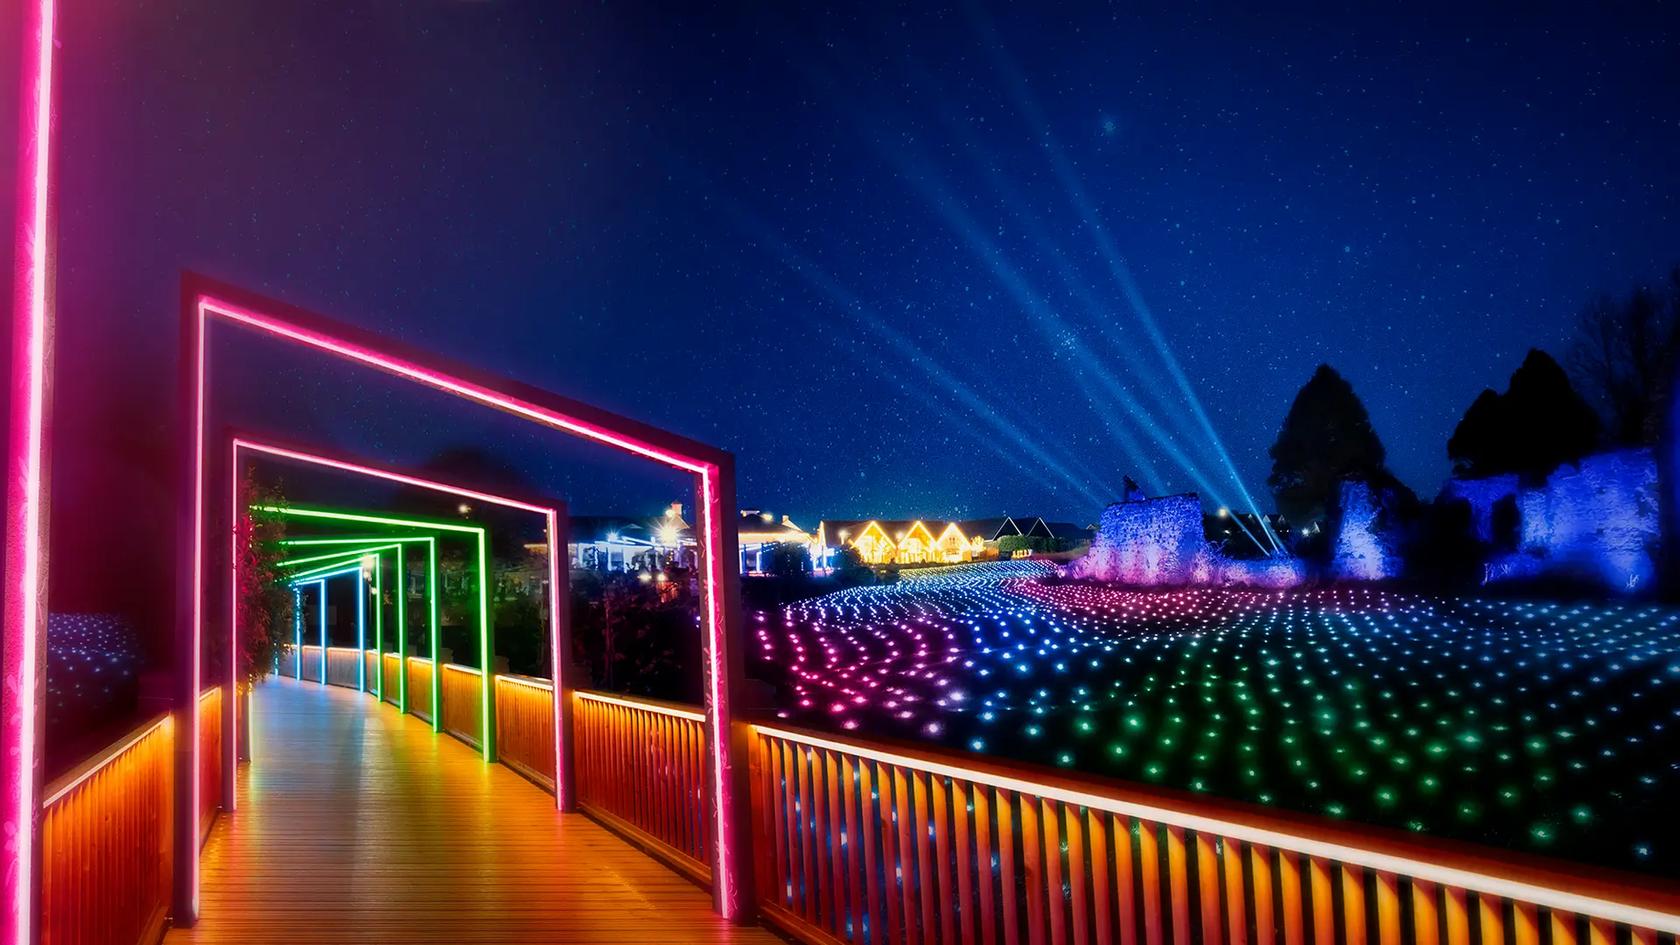 Enchanted Lights - Kildare Village